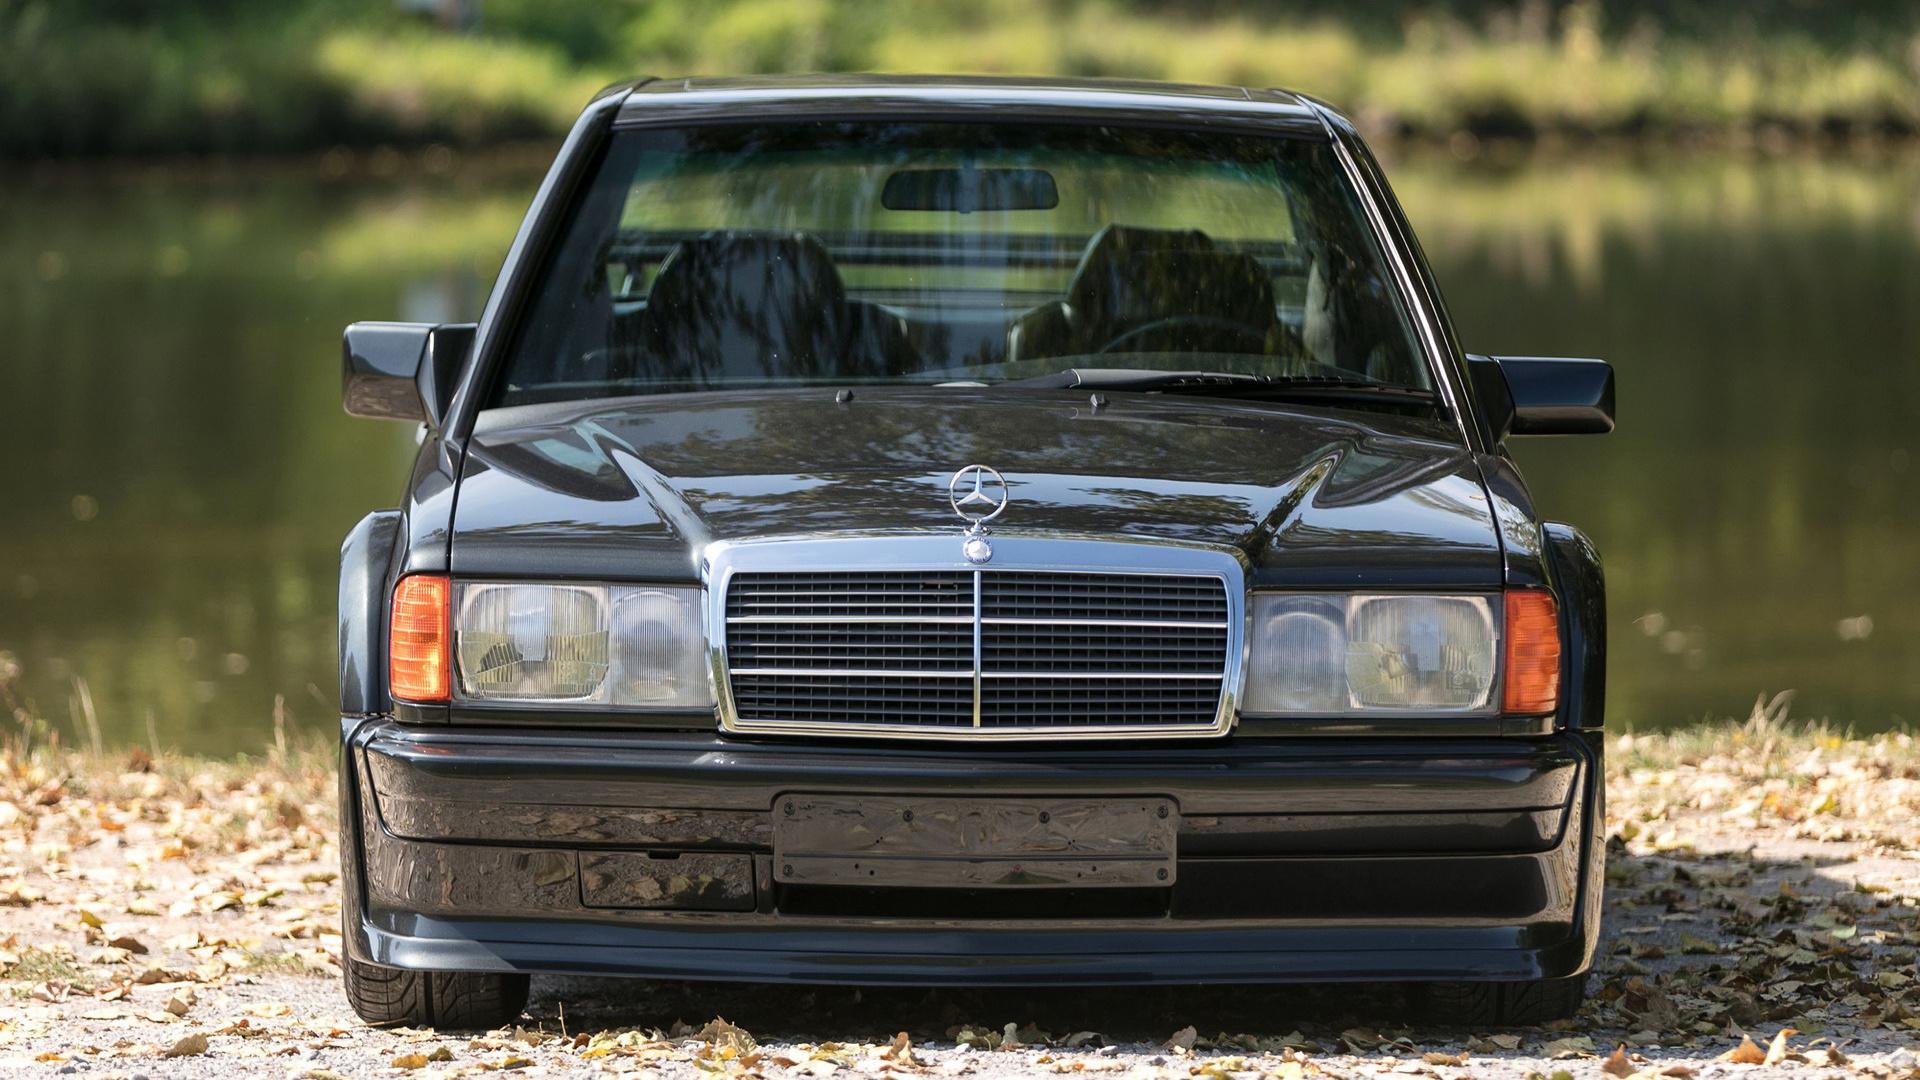 190 Vertical Wallpaper Hd: 1989 Mercedes-Benz 190 E 16v Evolution